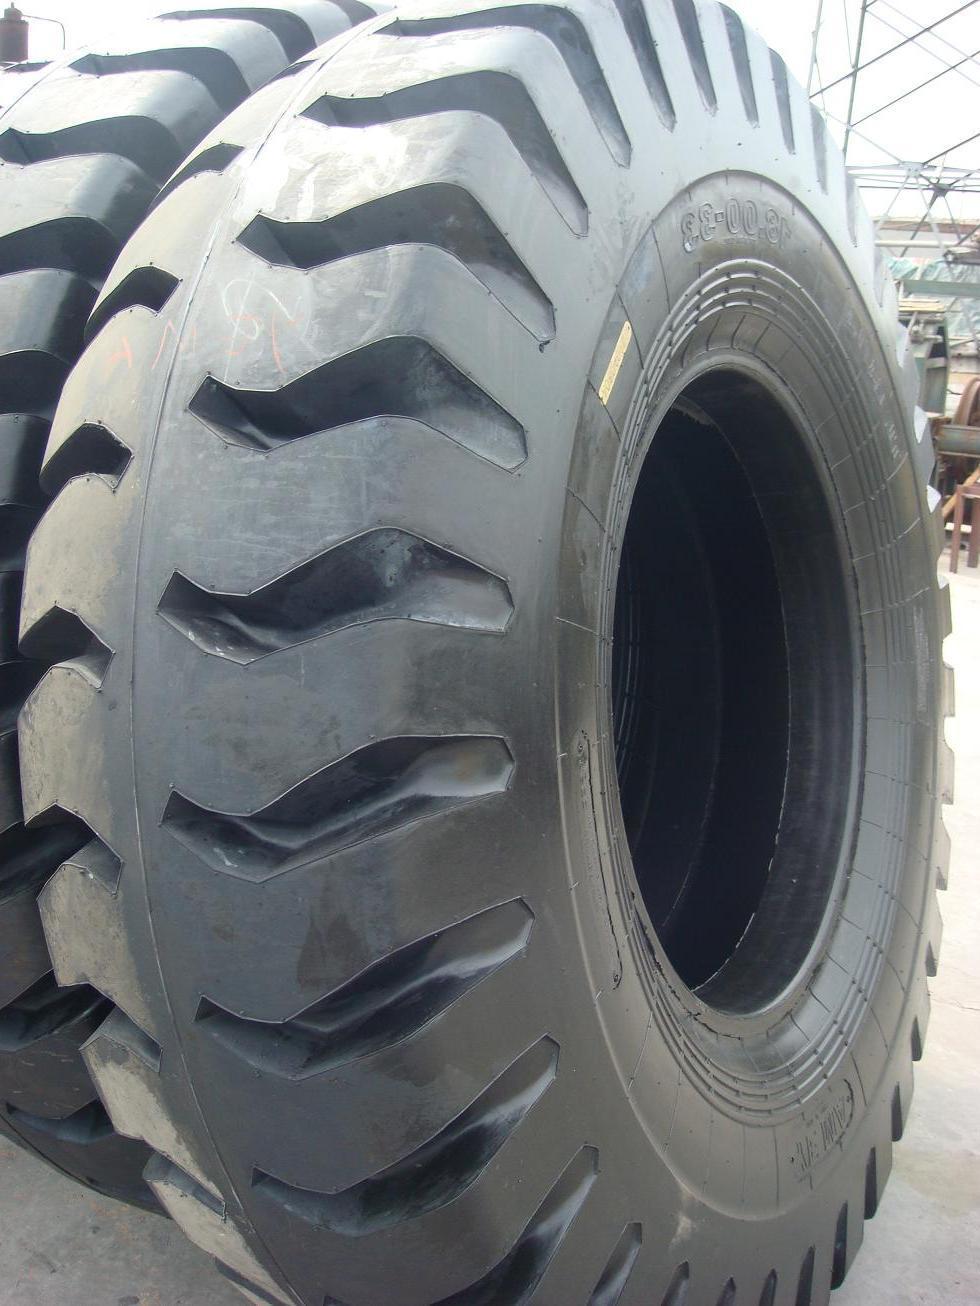 OTR Tires Dump Trucks Scrapers Haulage Earthmover Tires Neumaticos Excavadora